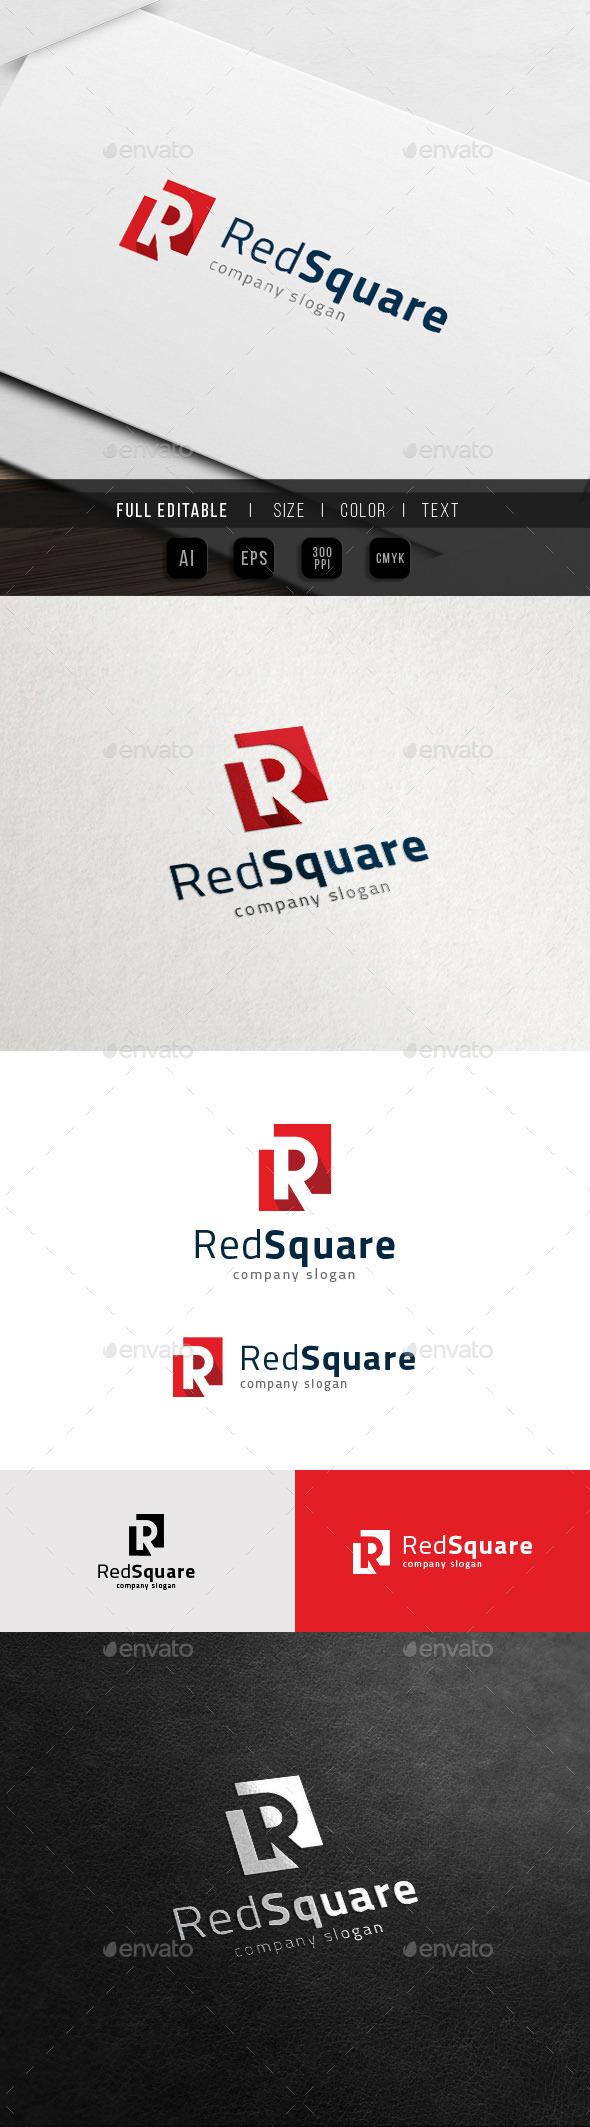 R Logo - Red Square - Real Estate